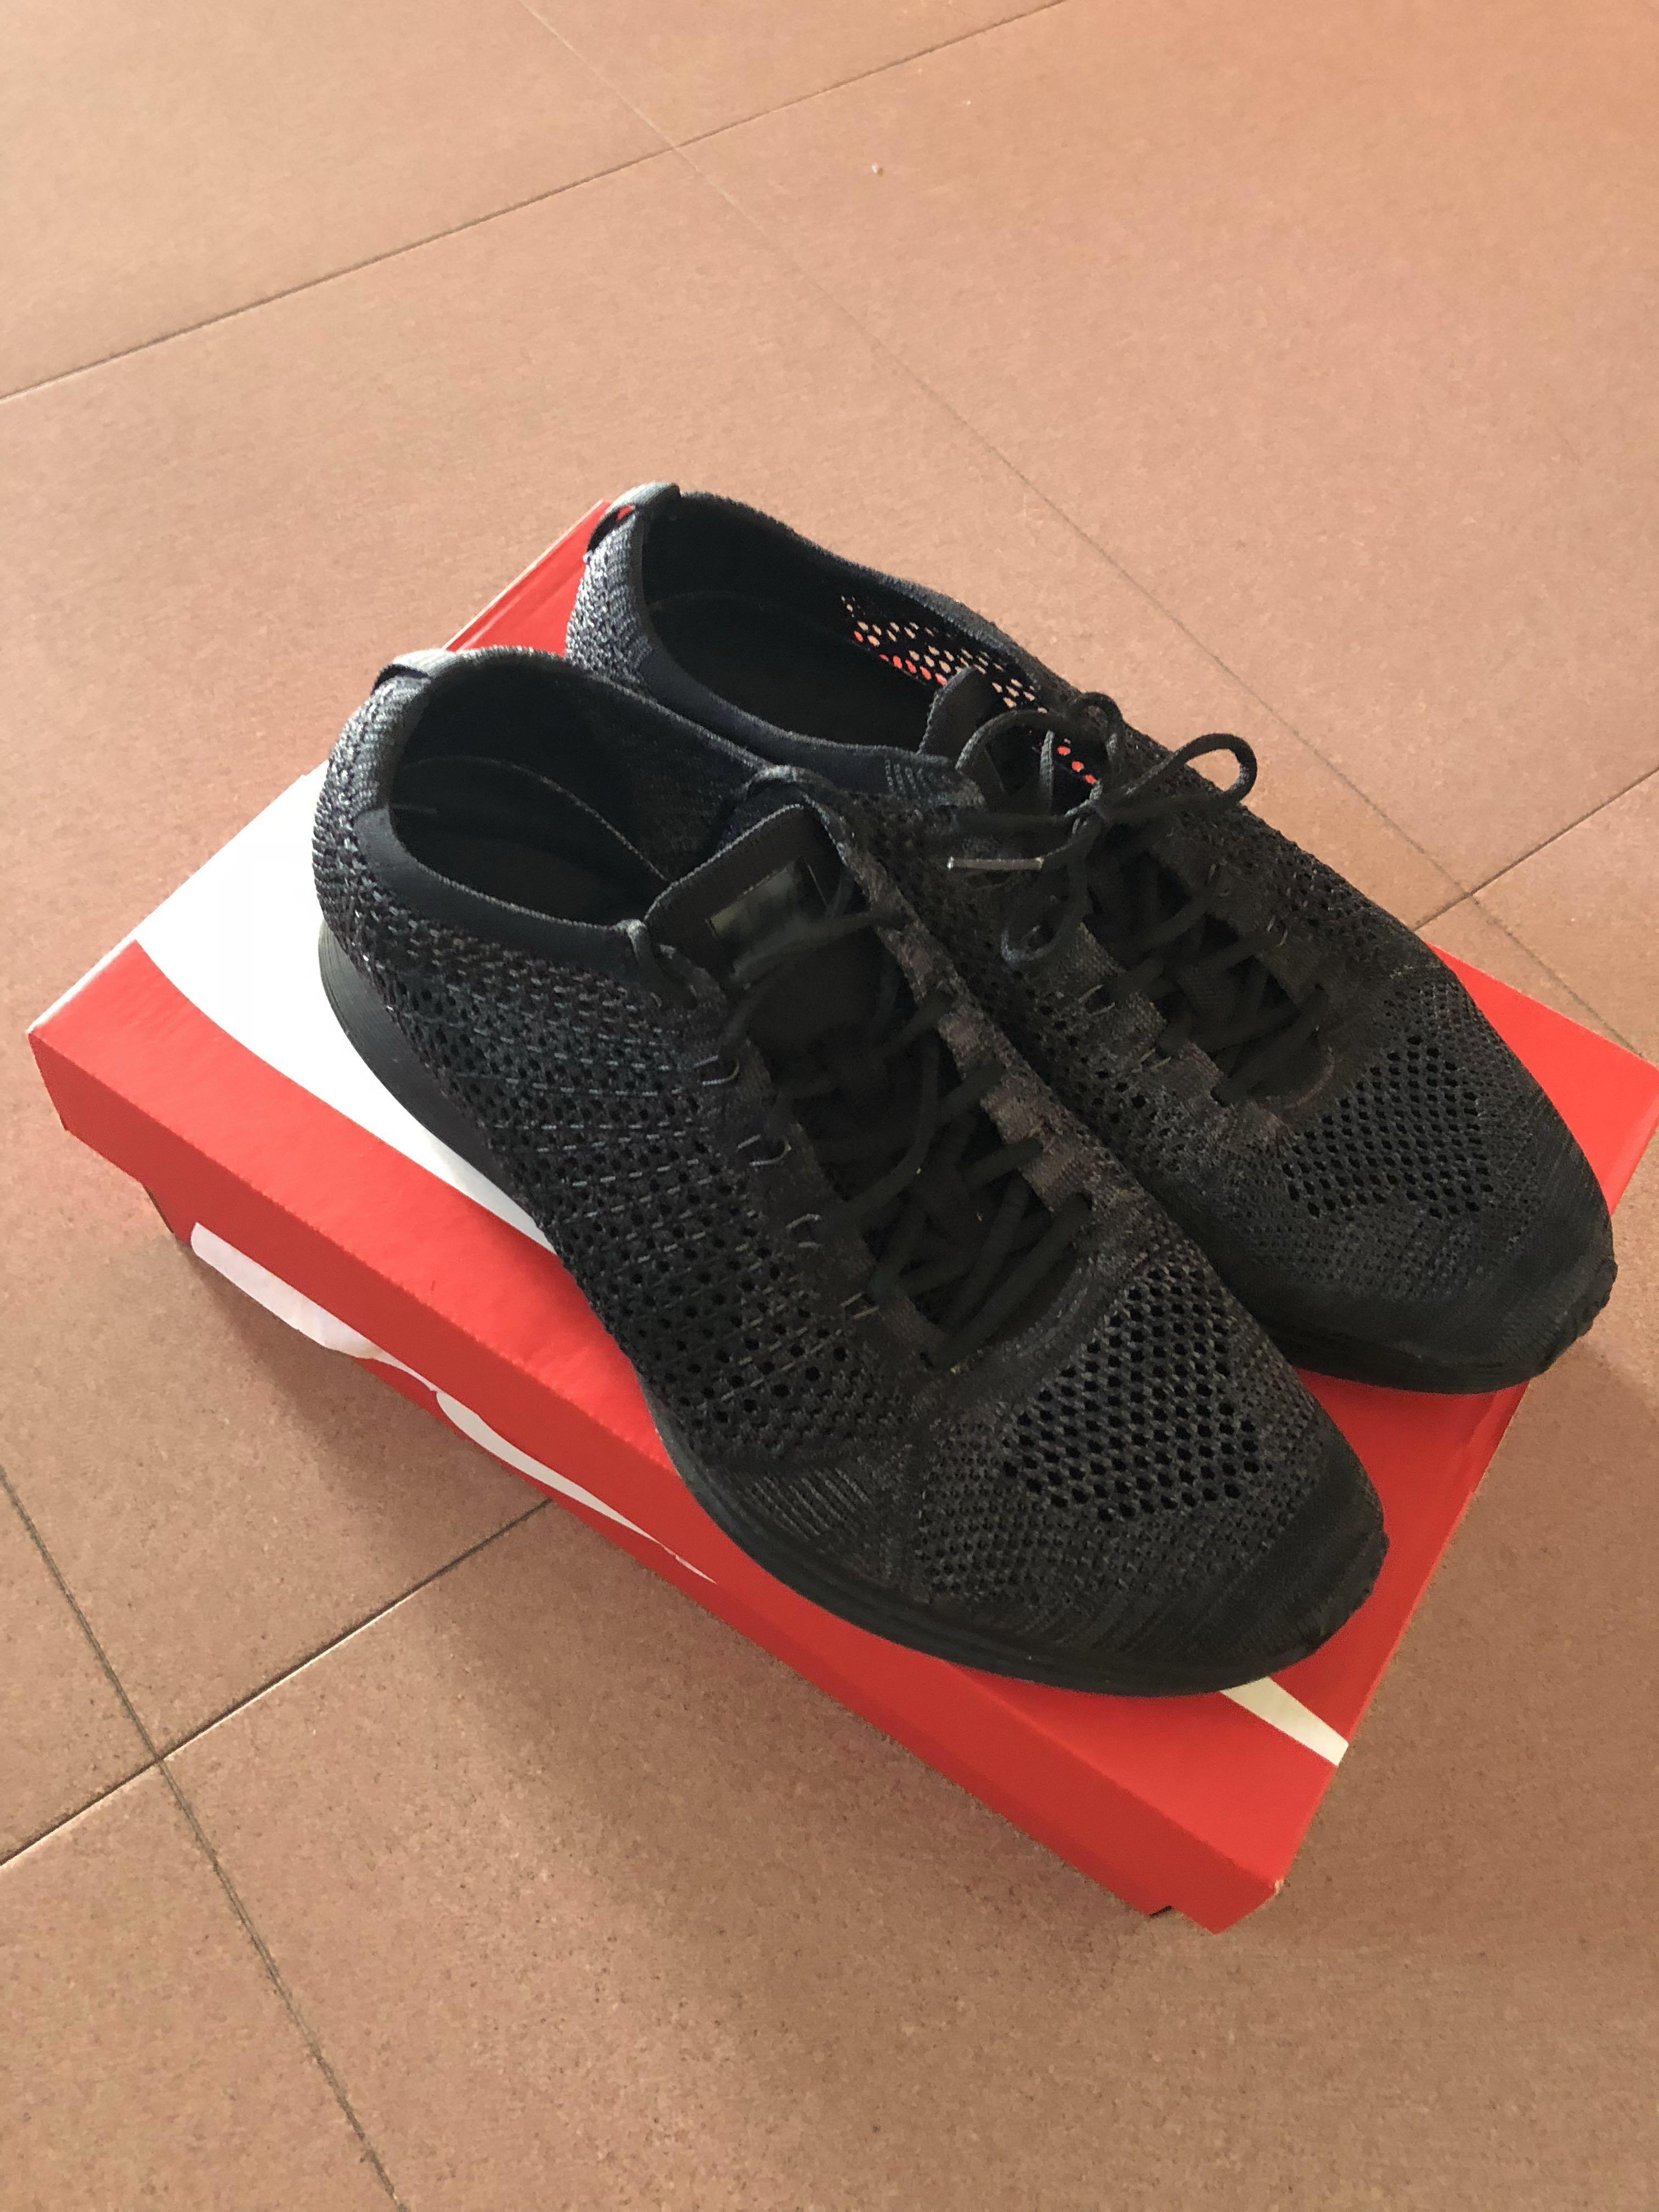 2745a2e35bd6 Nike Flyknit Racer Triple Black